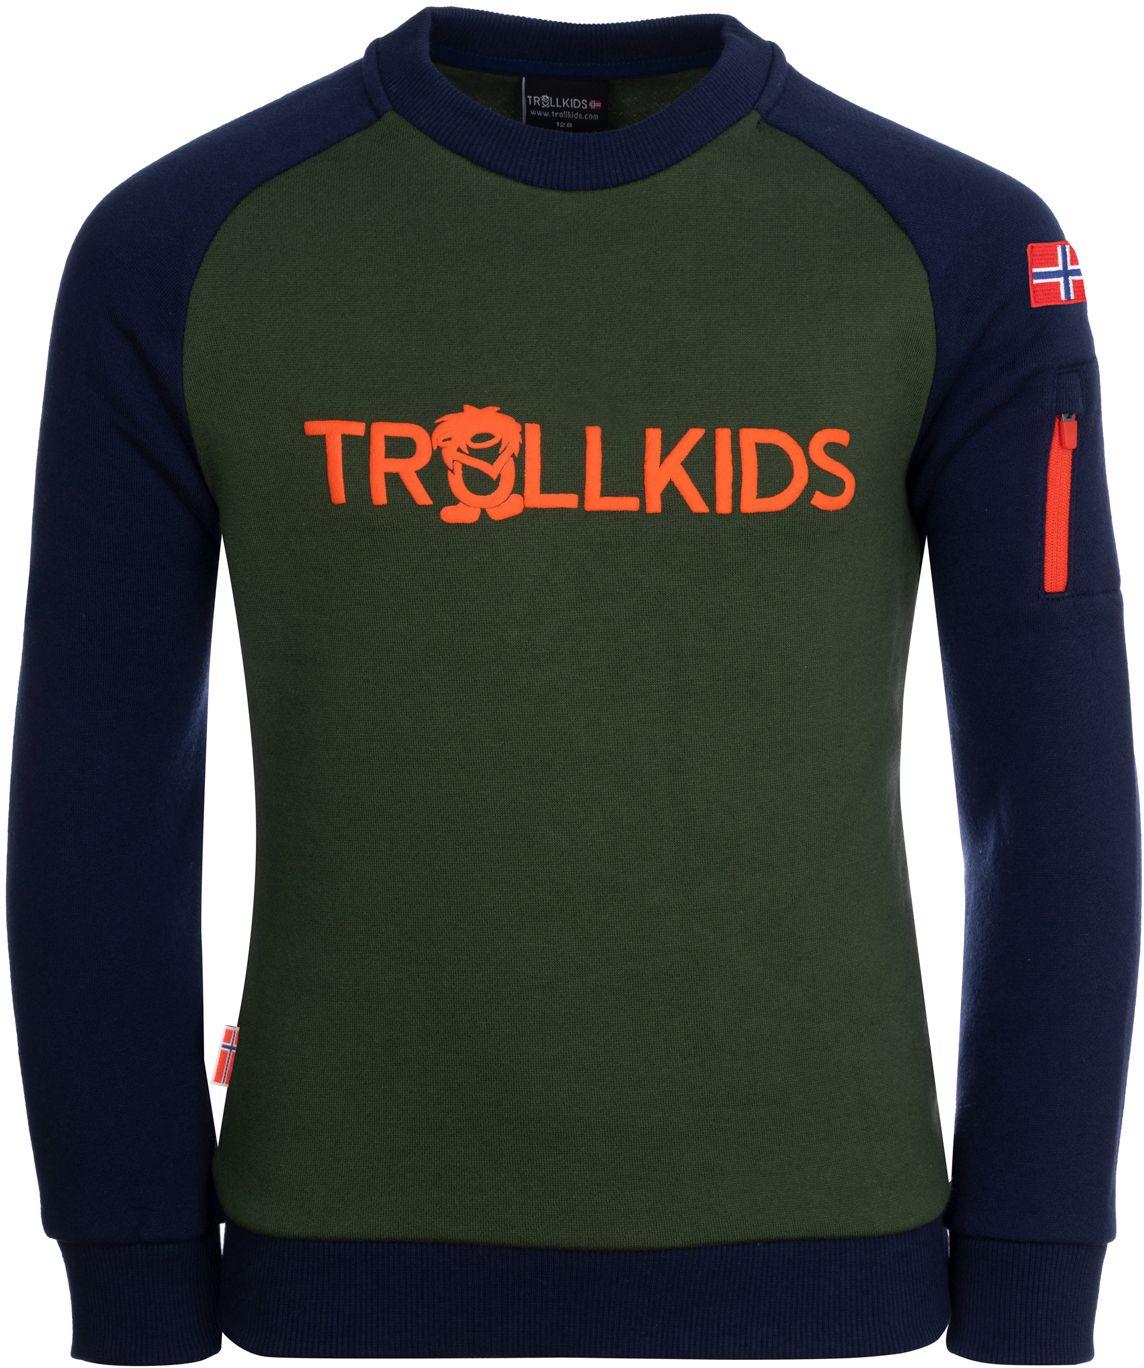 Trollkids Sandefjord Sweatshirt Forest Green/Navy